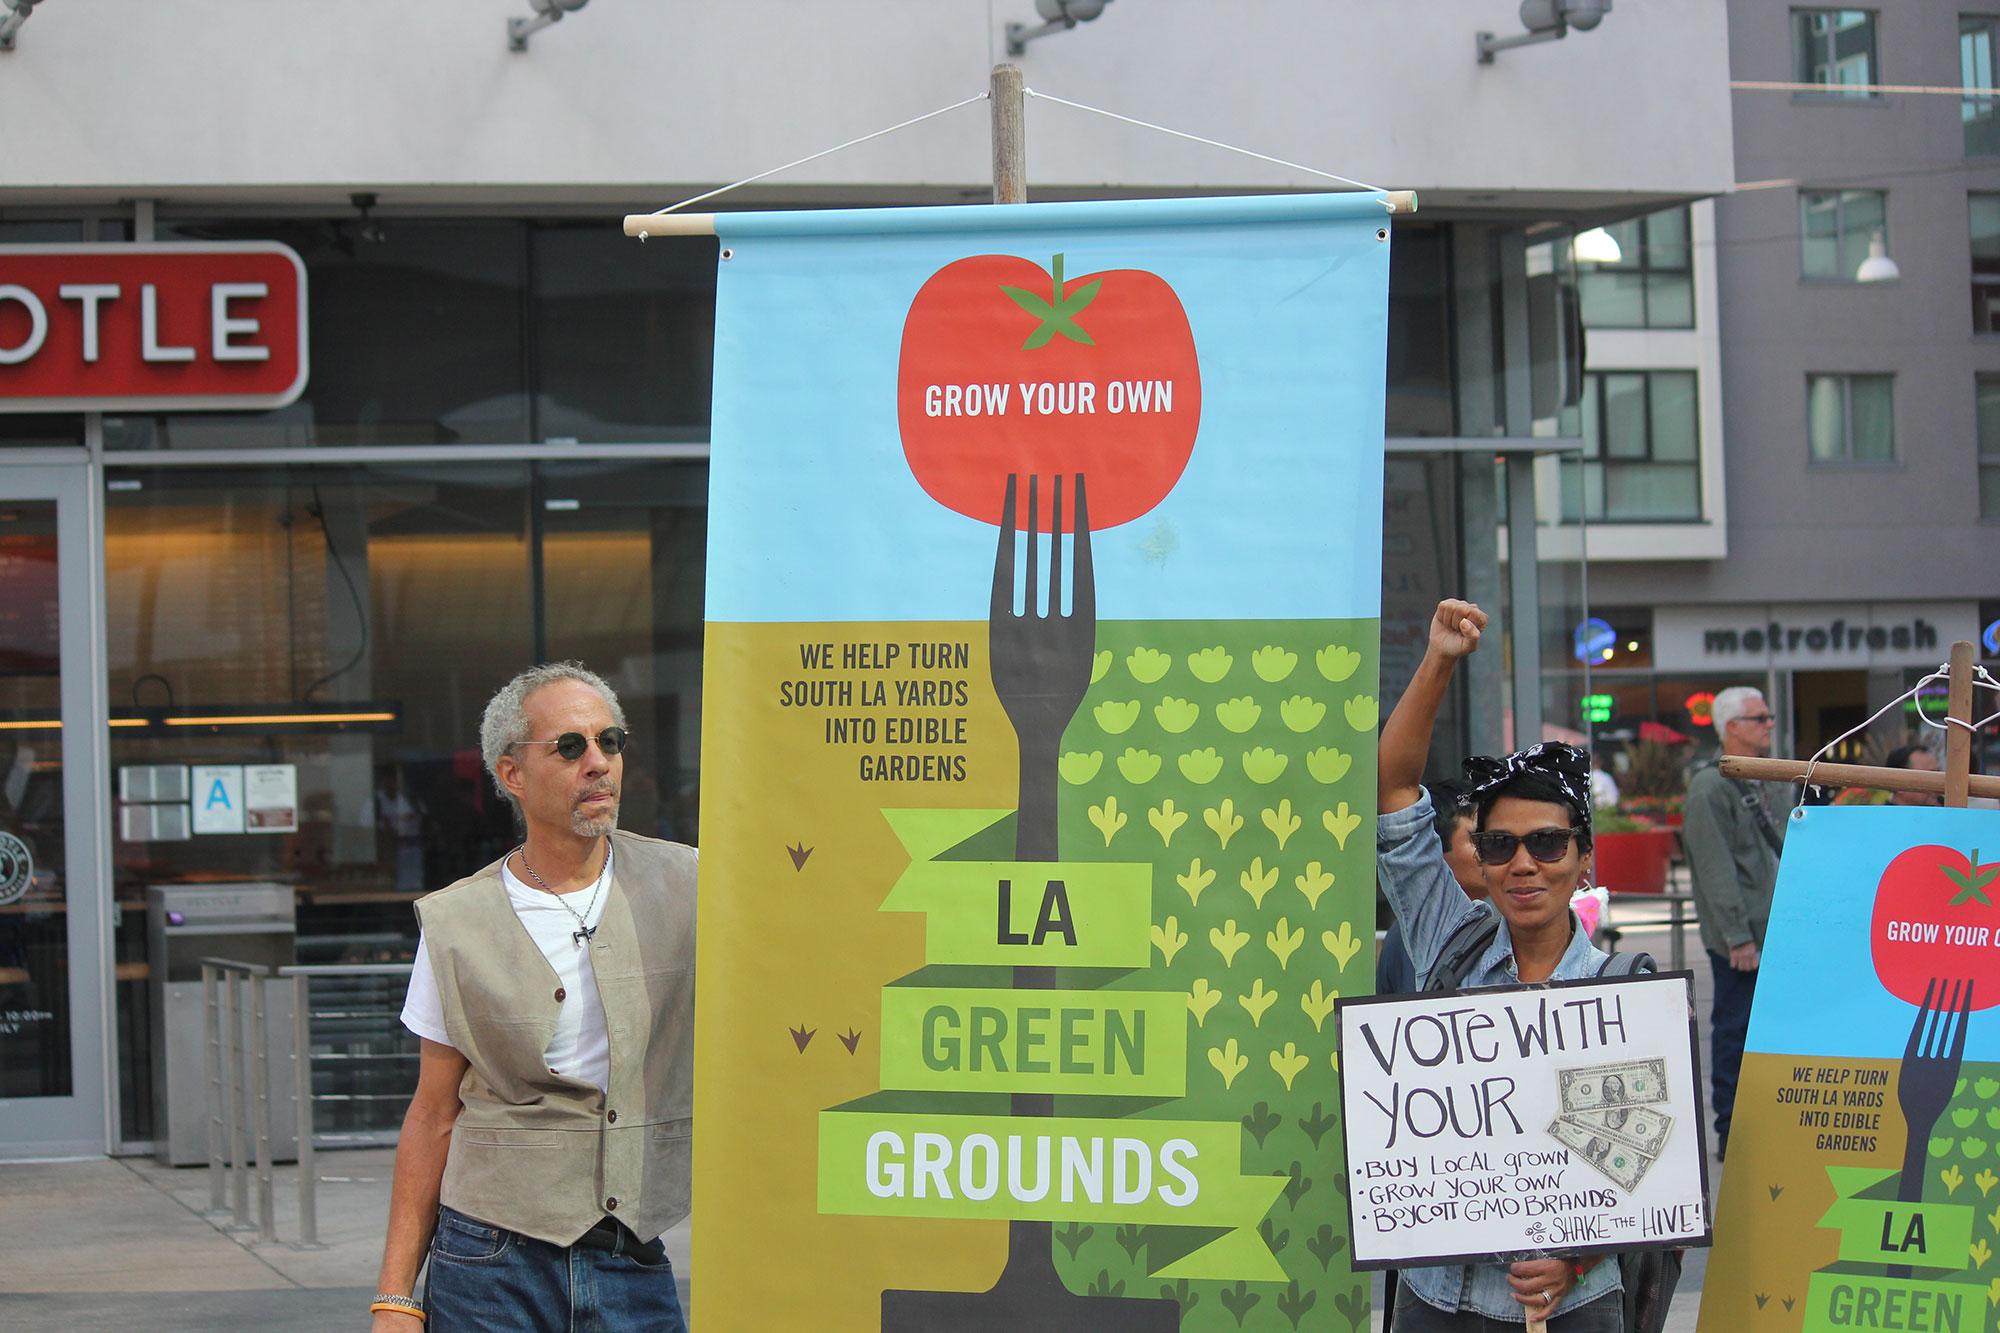 LA Green Grounds